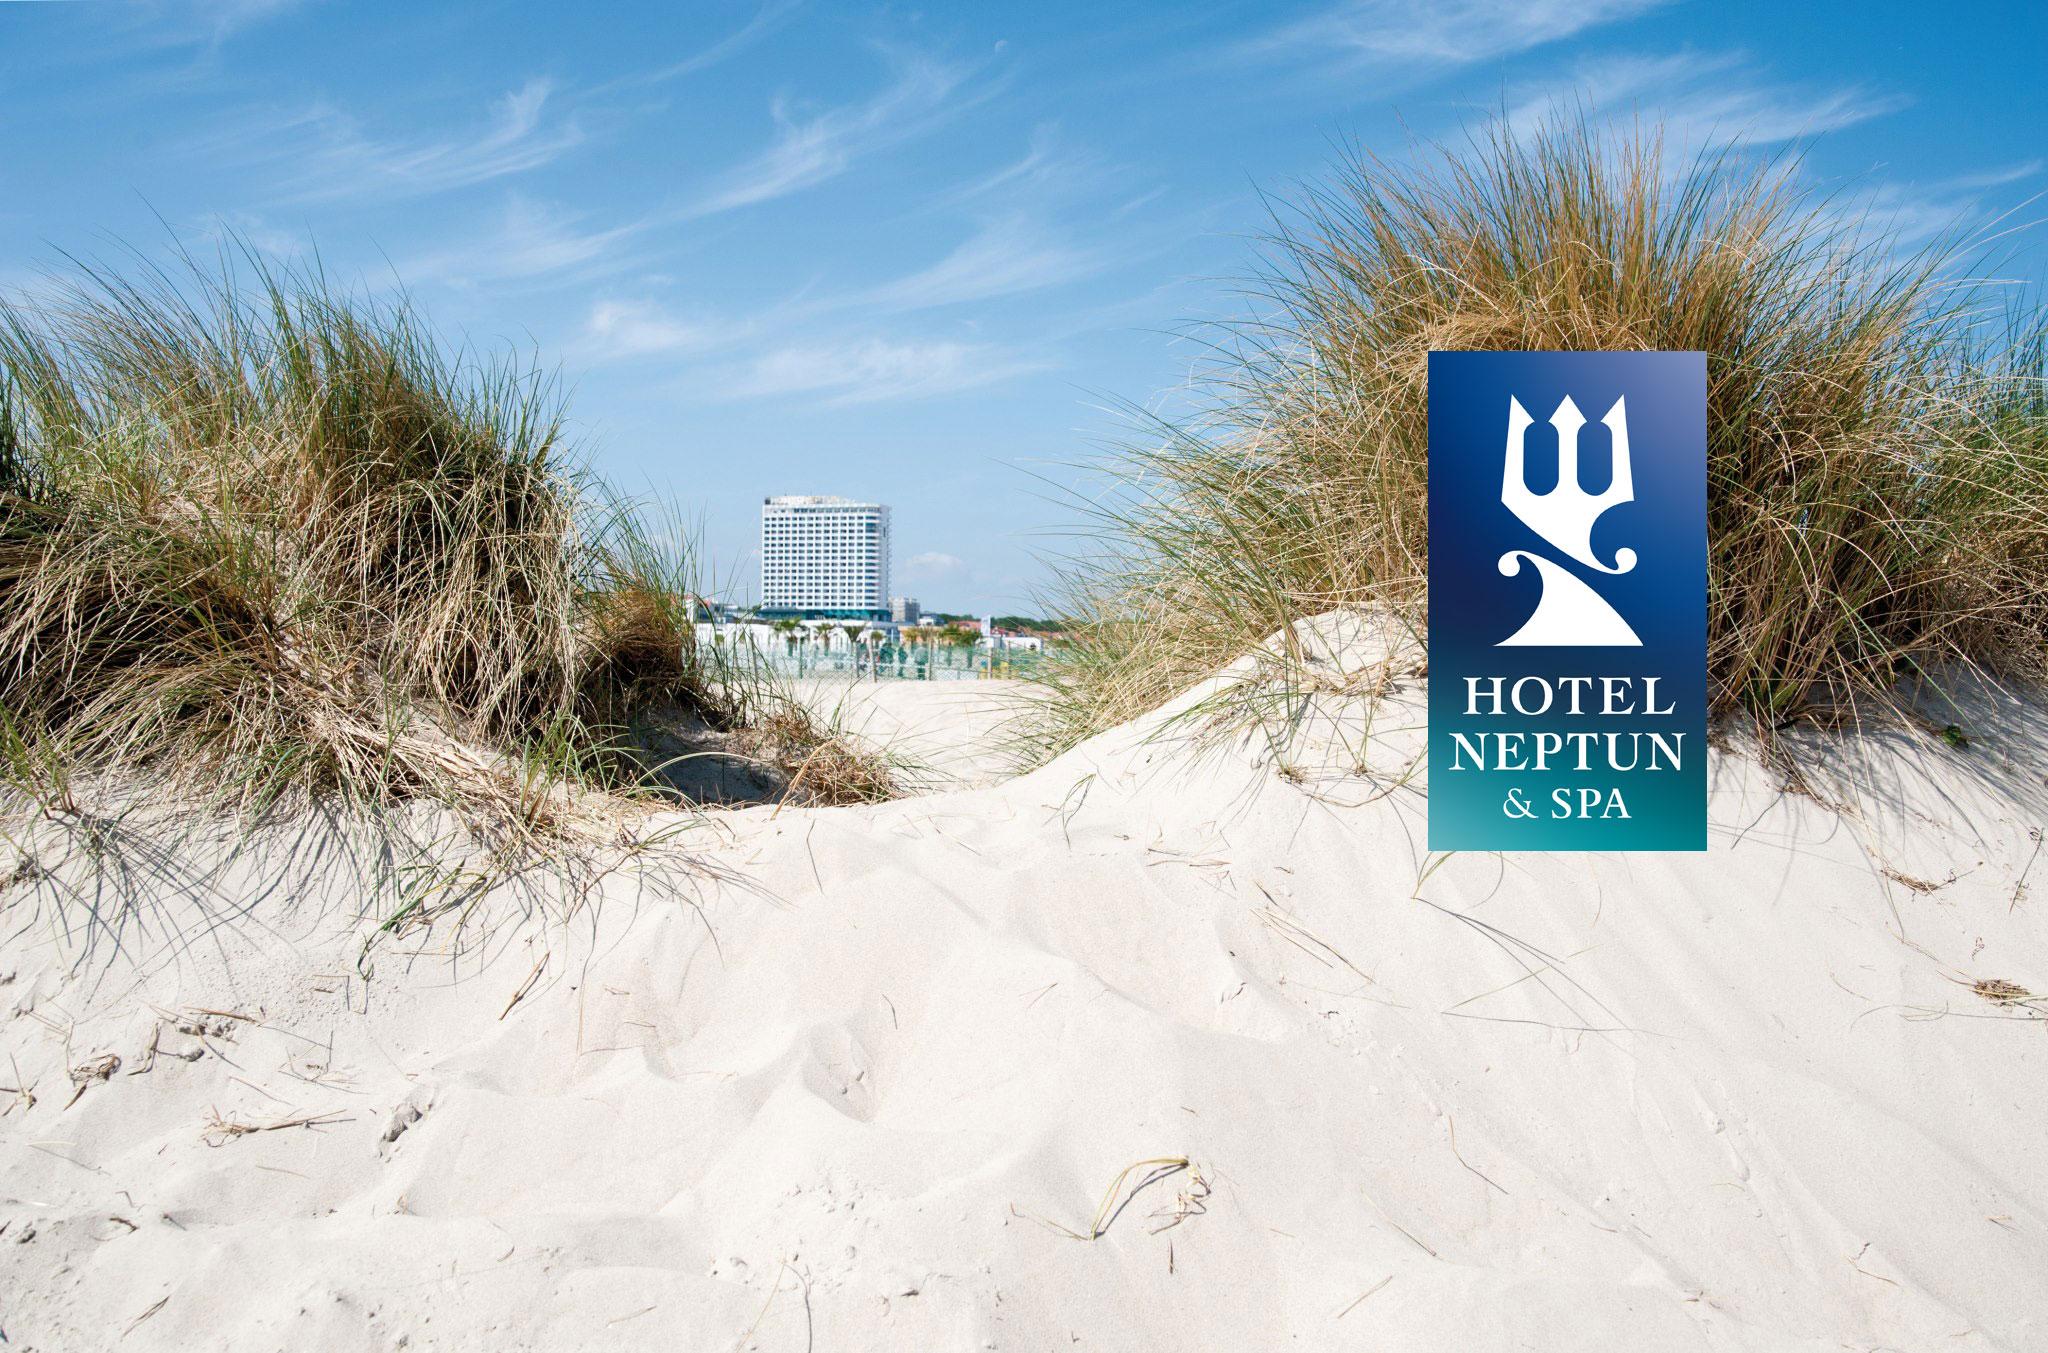 Hotel Neptun Karls Freunde